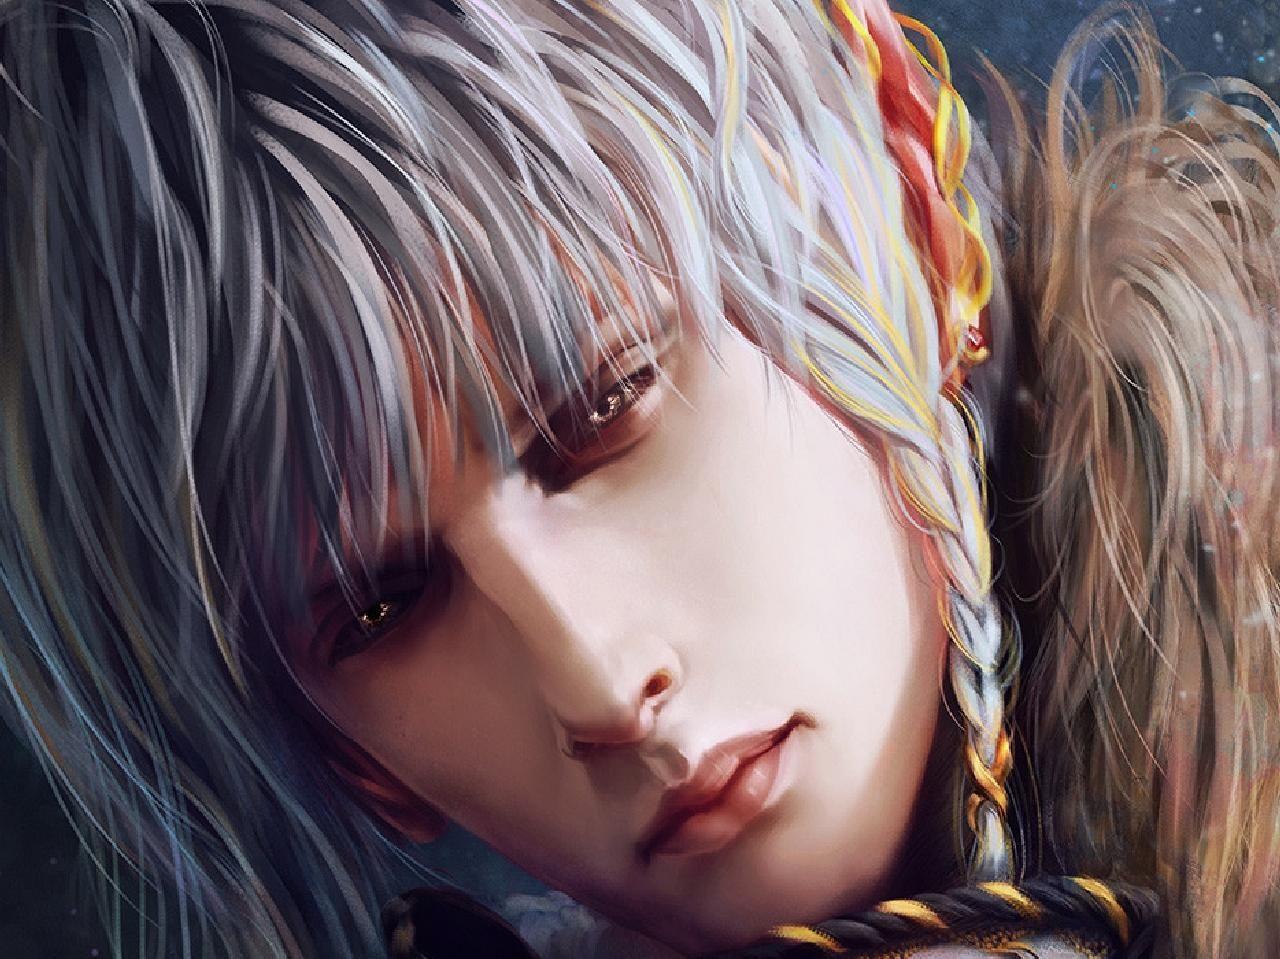 Pin By Question Ping On Anime Boy Digital Art Gallery Fantasy Art Men Realistic Art